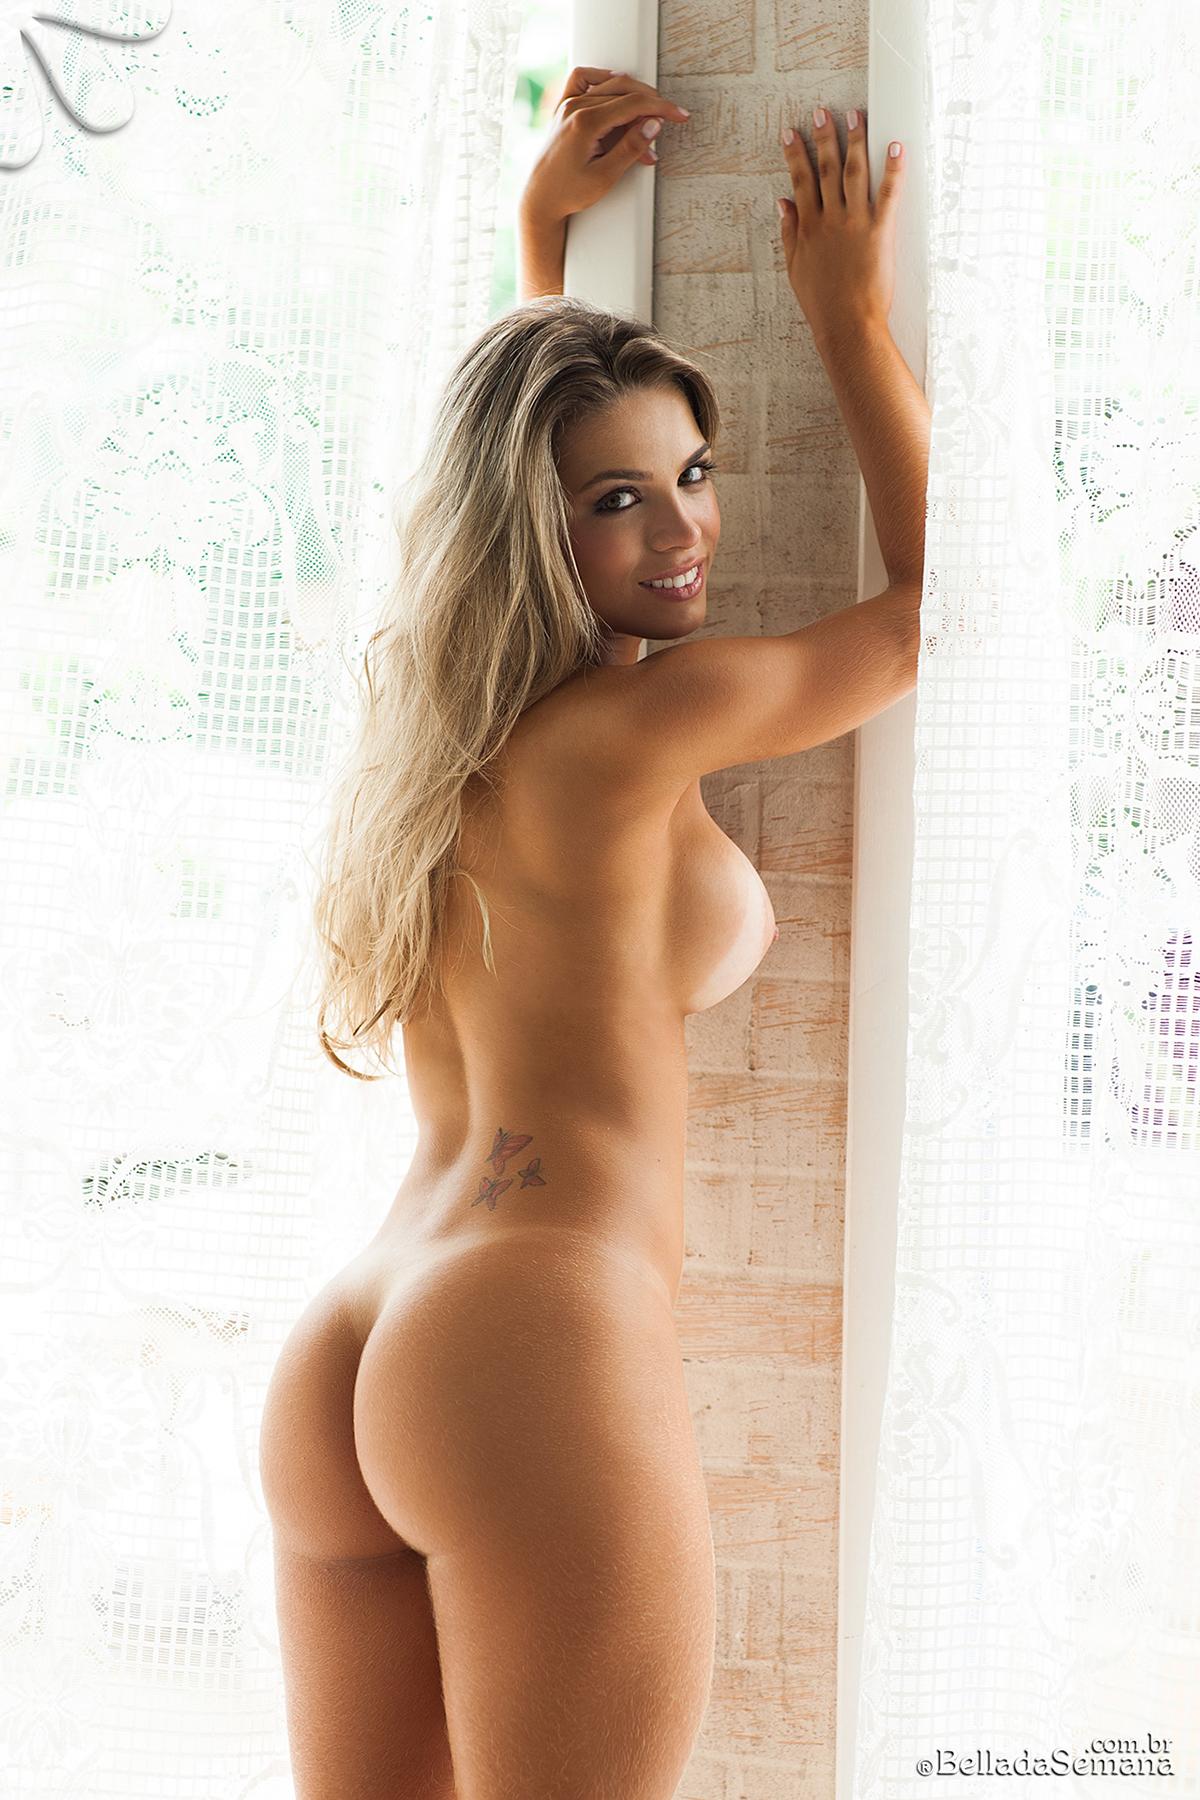 Amanda Follando amanda sagaz via bella club - picture #12 - exgirlfriend